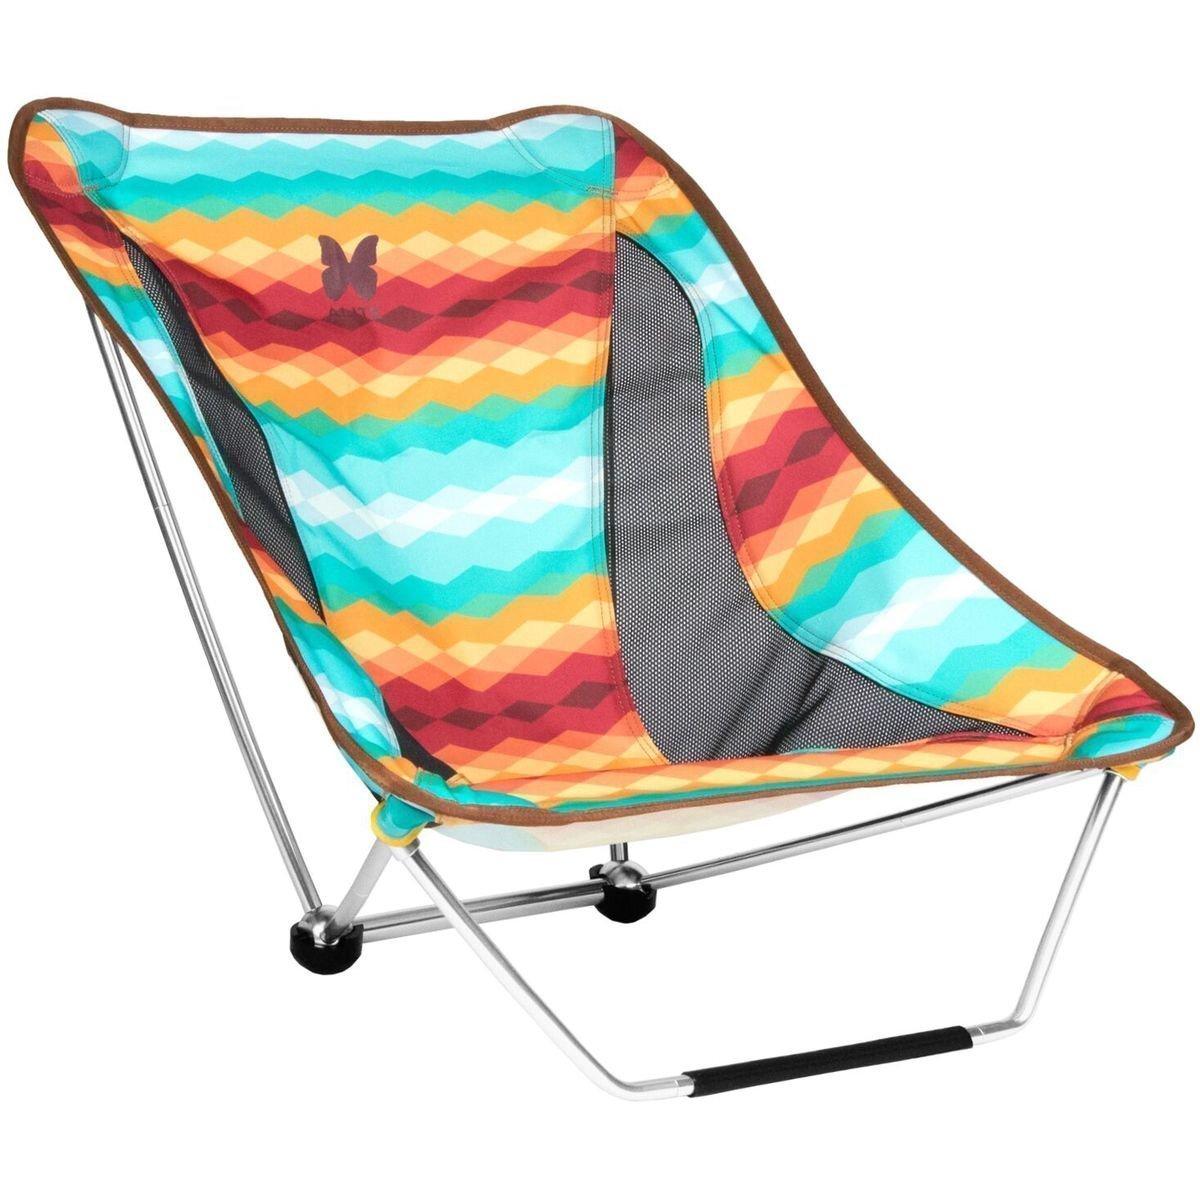 Alite (エーライト) Mayfly Chair (メイフライチェア) [並行輸入品] B07CJWTM88 サウスウエスト サウスウエスト